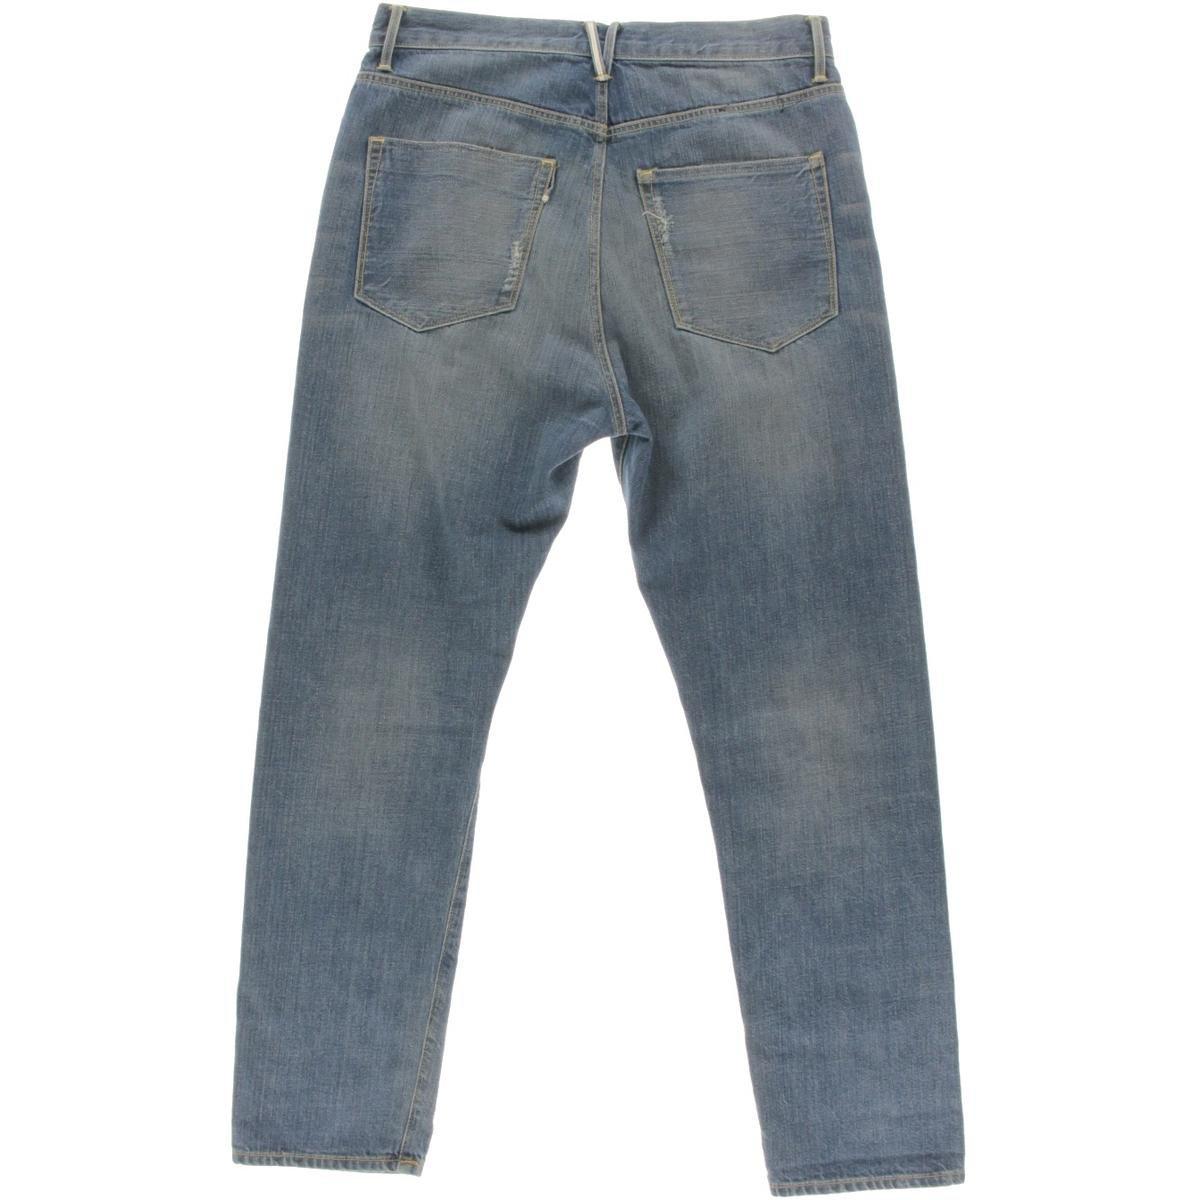 3x1 Womens W4 High Rise Cropped Boyfriend Jeans